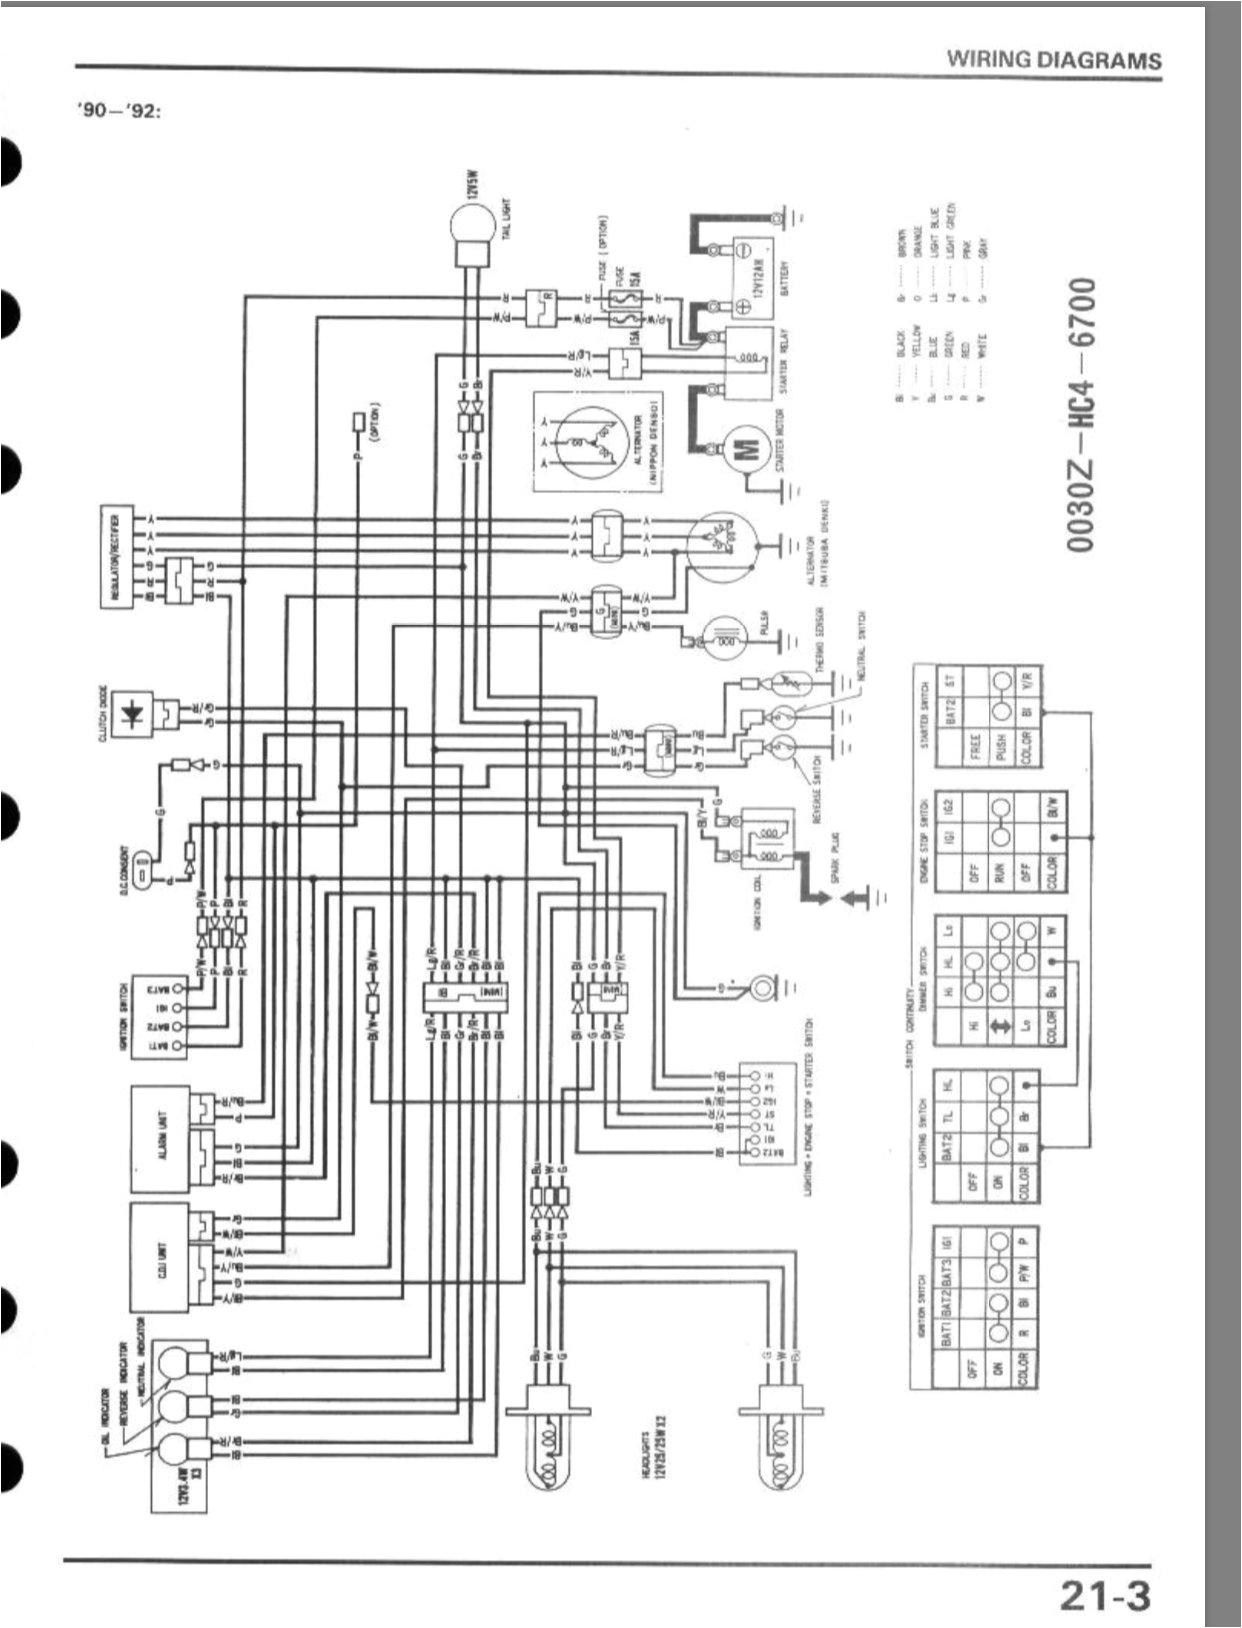 Honda Fourtrax 250 Wiring Diagram 1988 Honda Fourtrax Electrical issues Honda atv forum